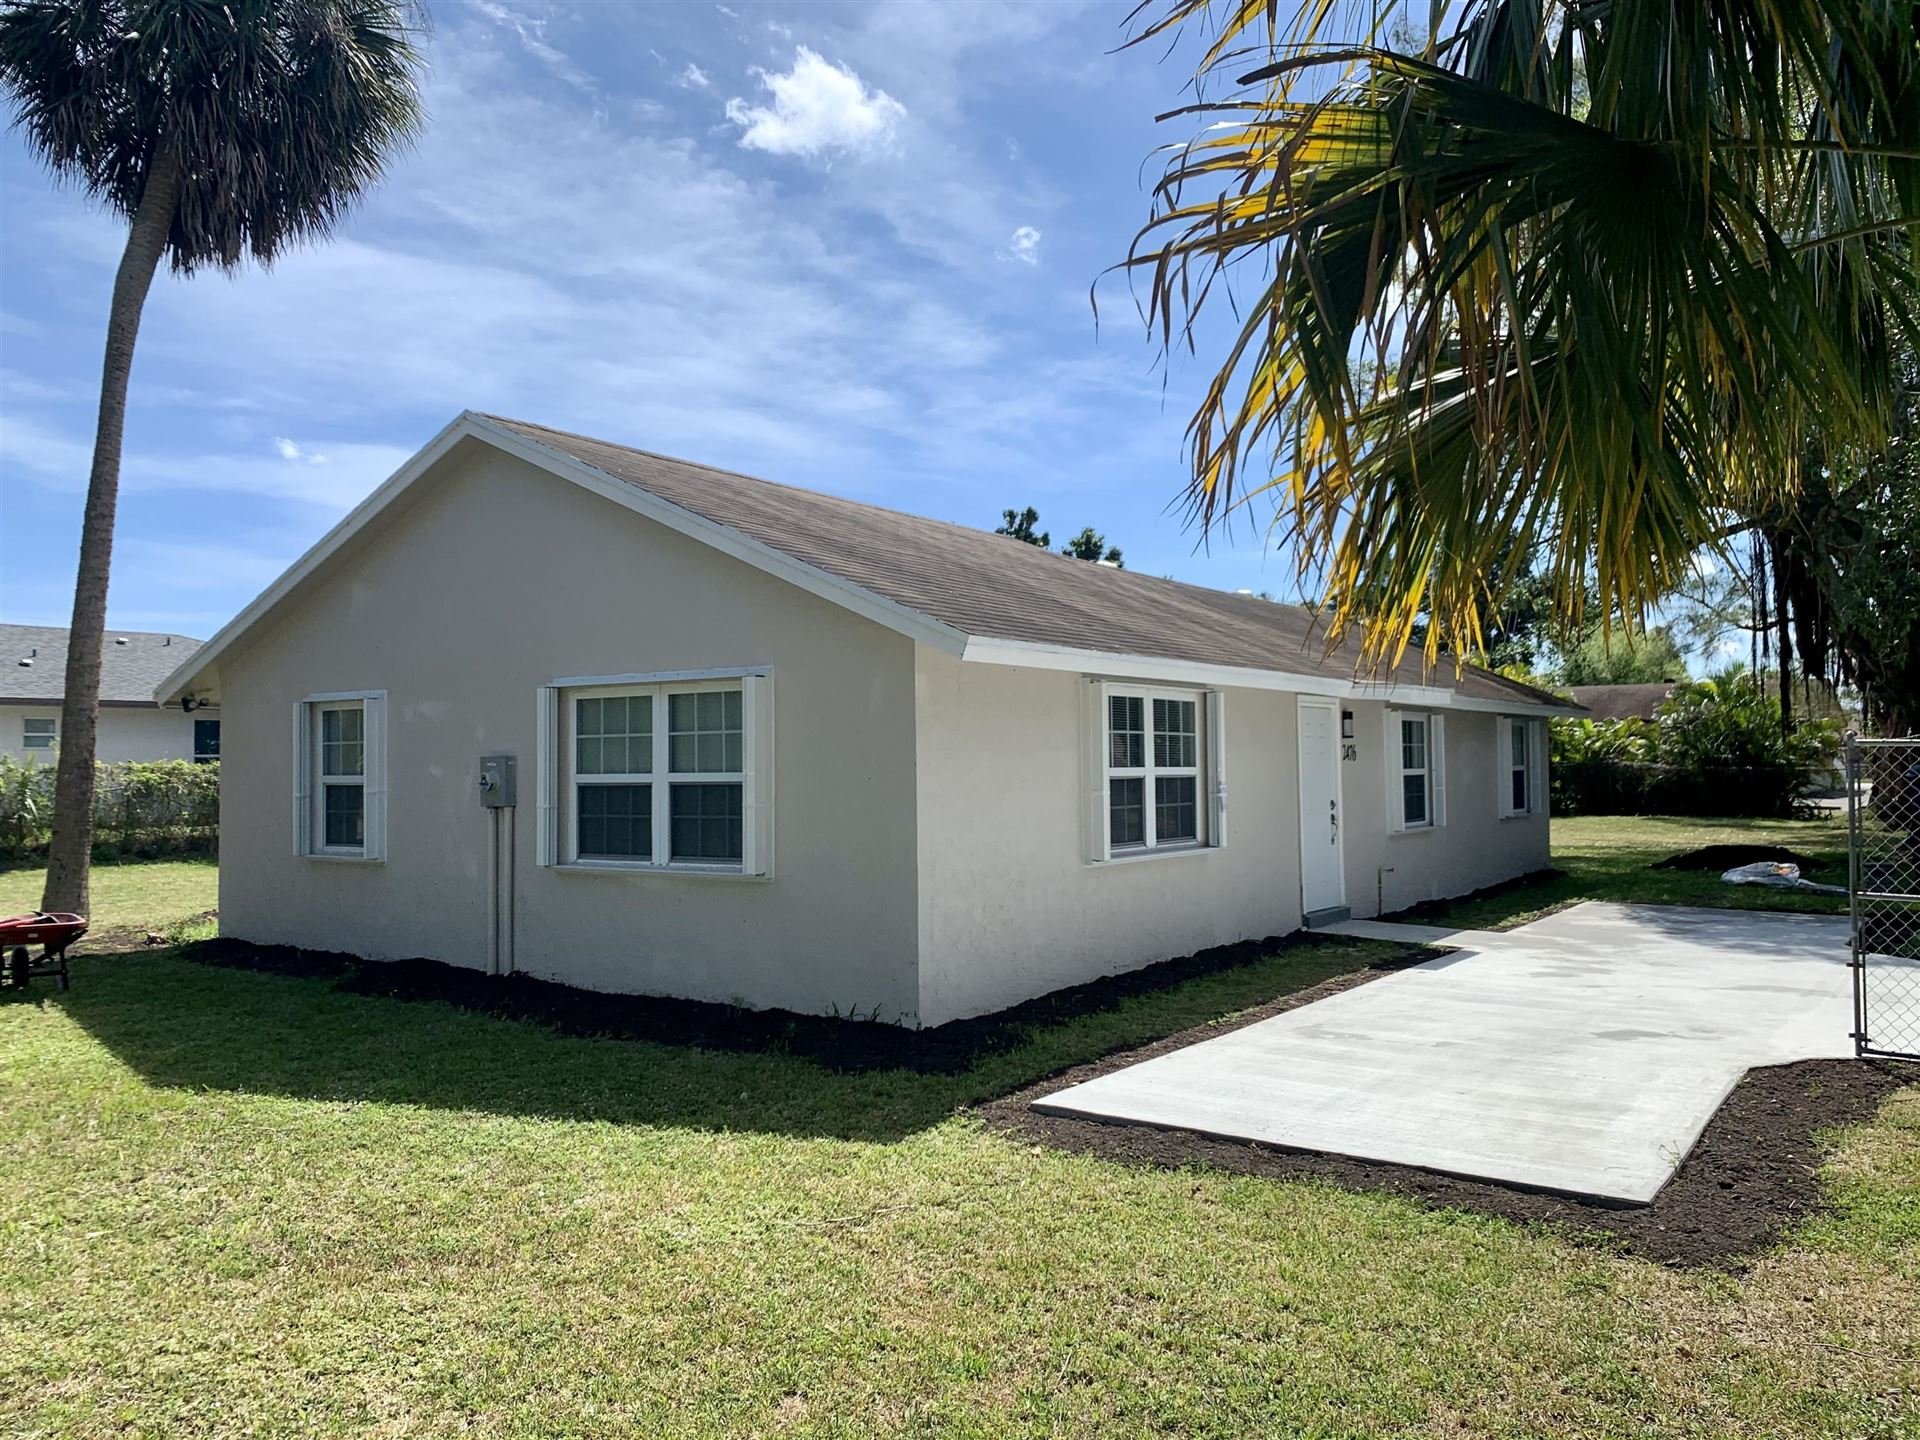 2476 Queen Street, West Palm Beach, FL 33417 - MLS#: RX-10697502